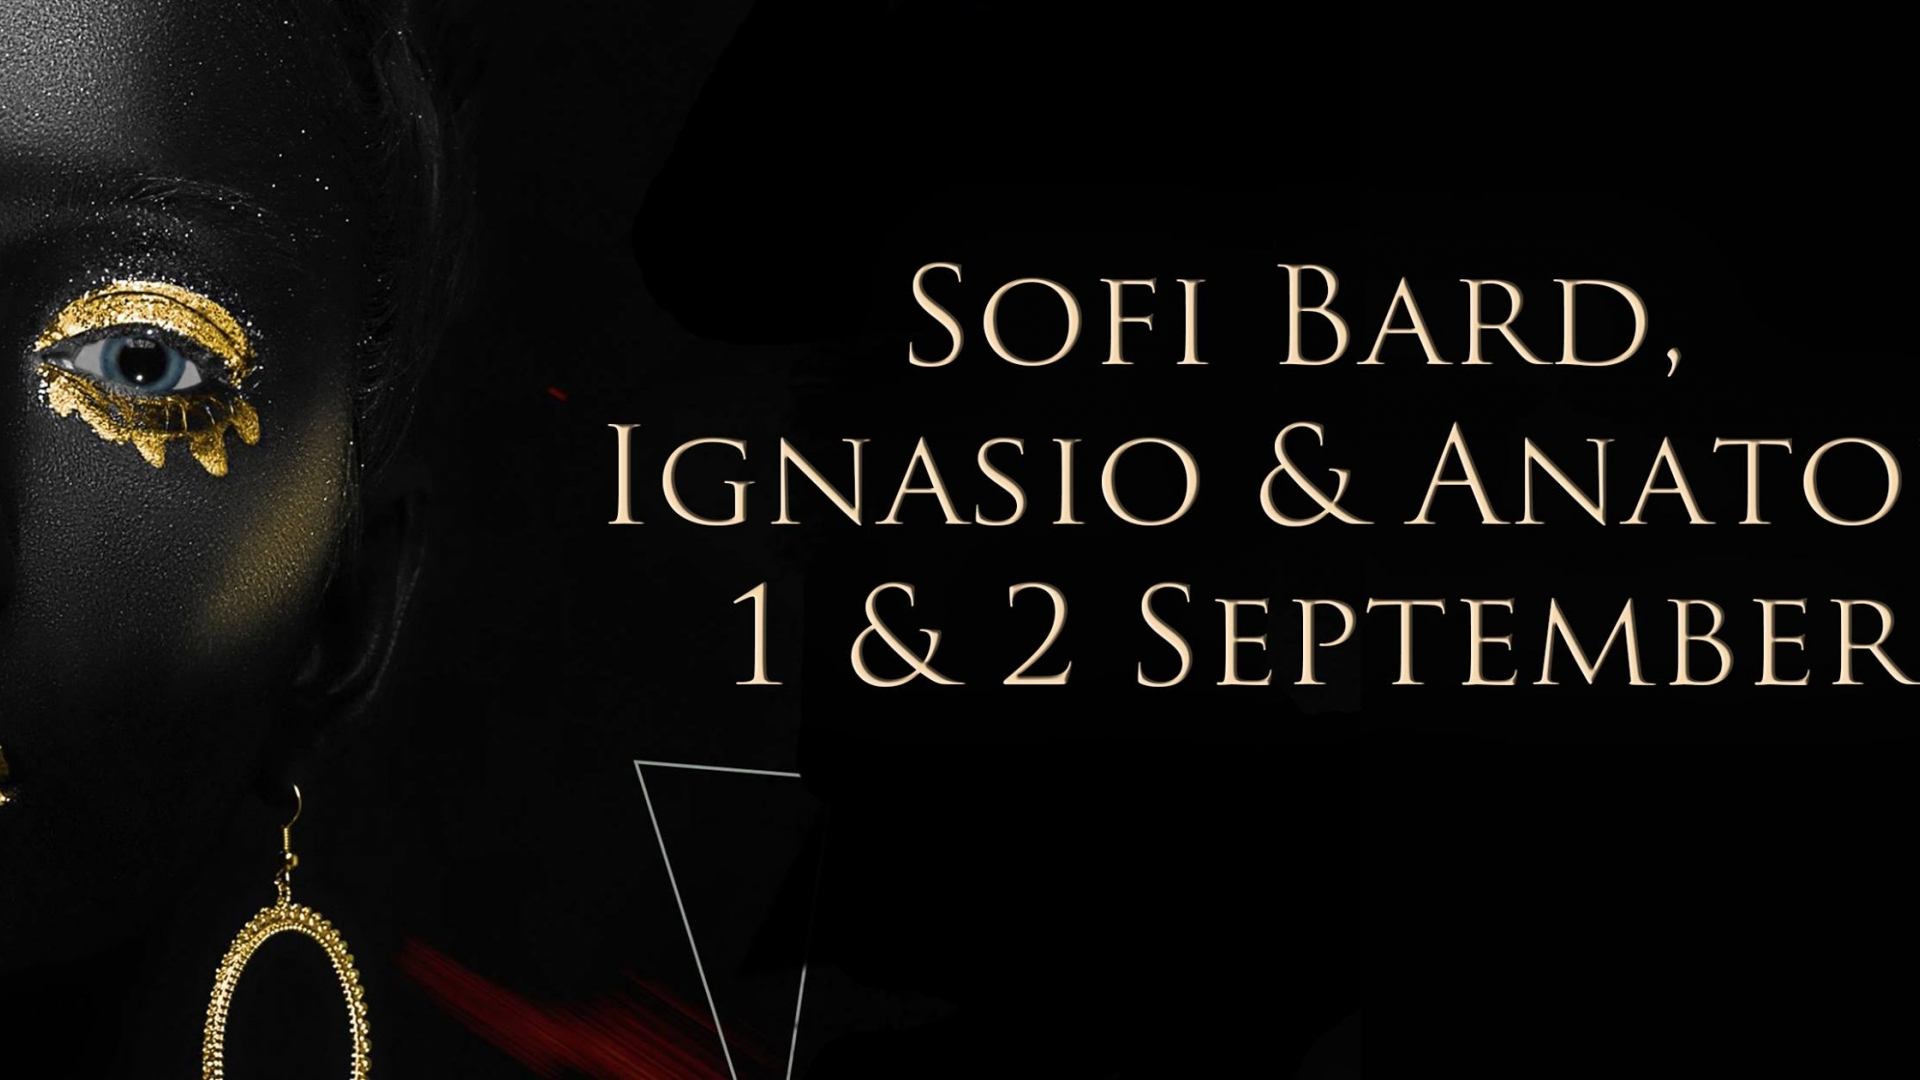 1 - 2 септември 2017 - Софи Бард, Игнасио и Анатоли в Live Club Canto